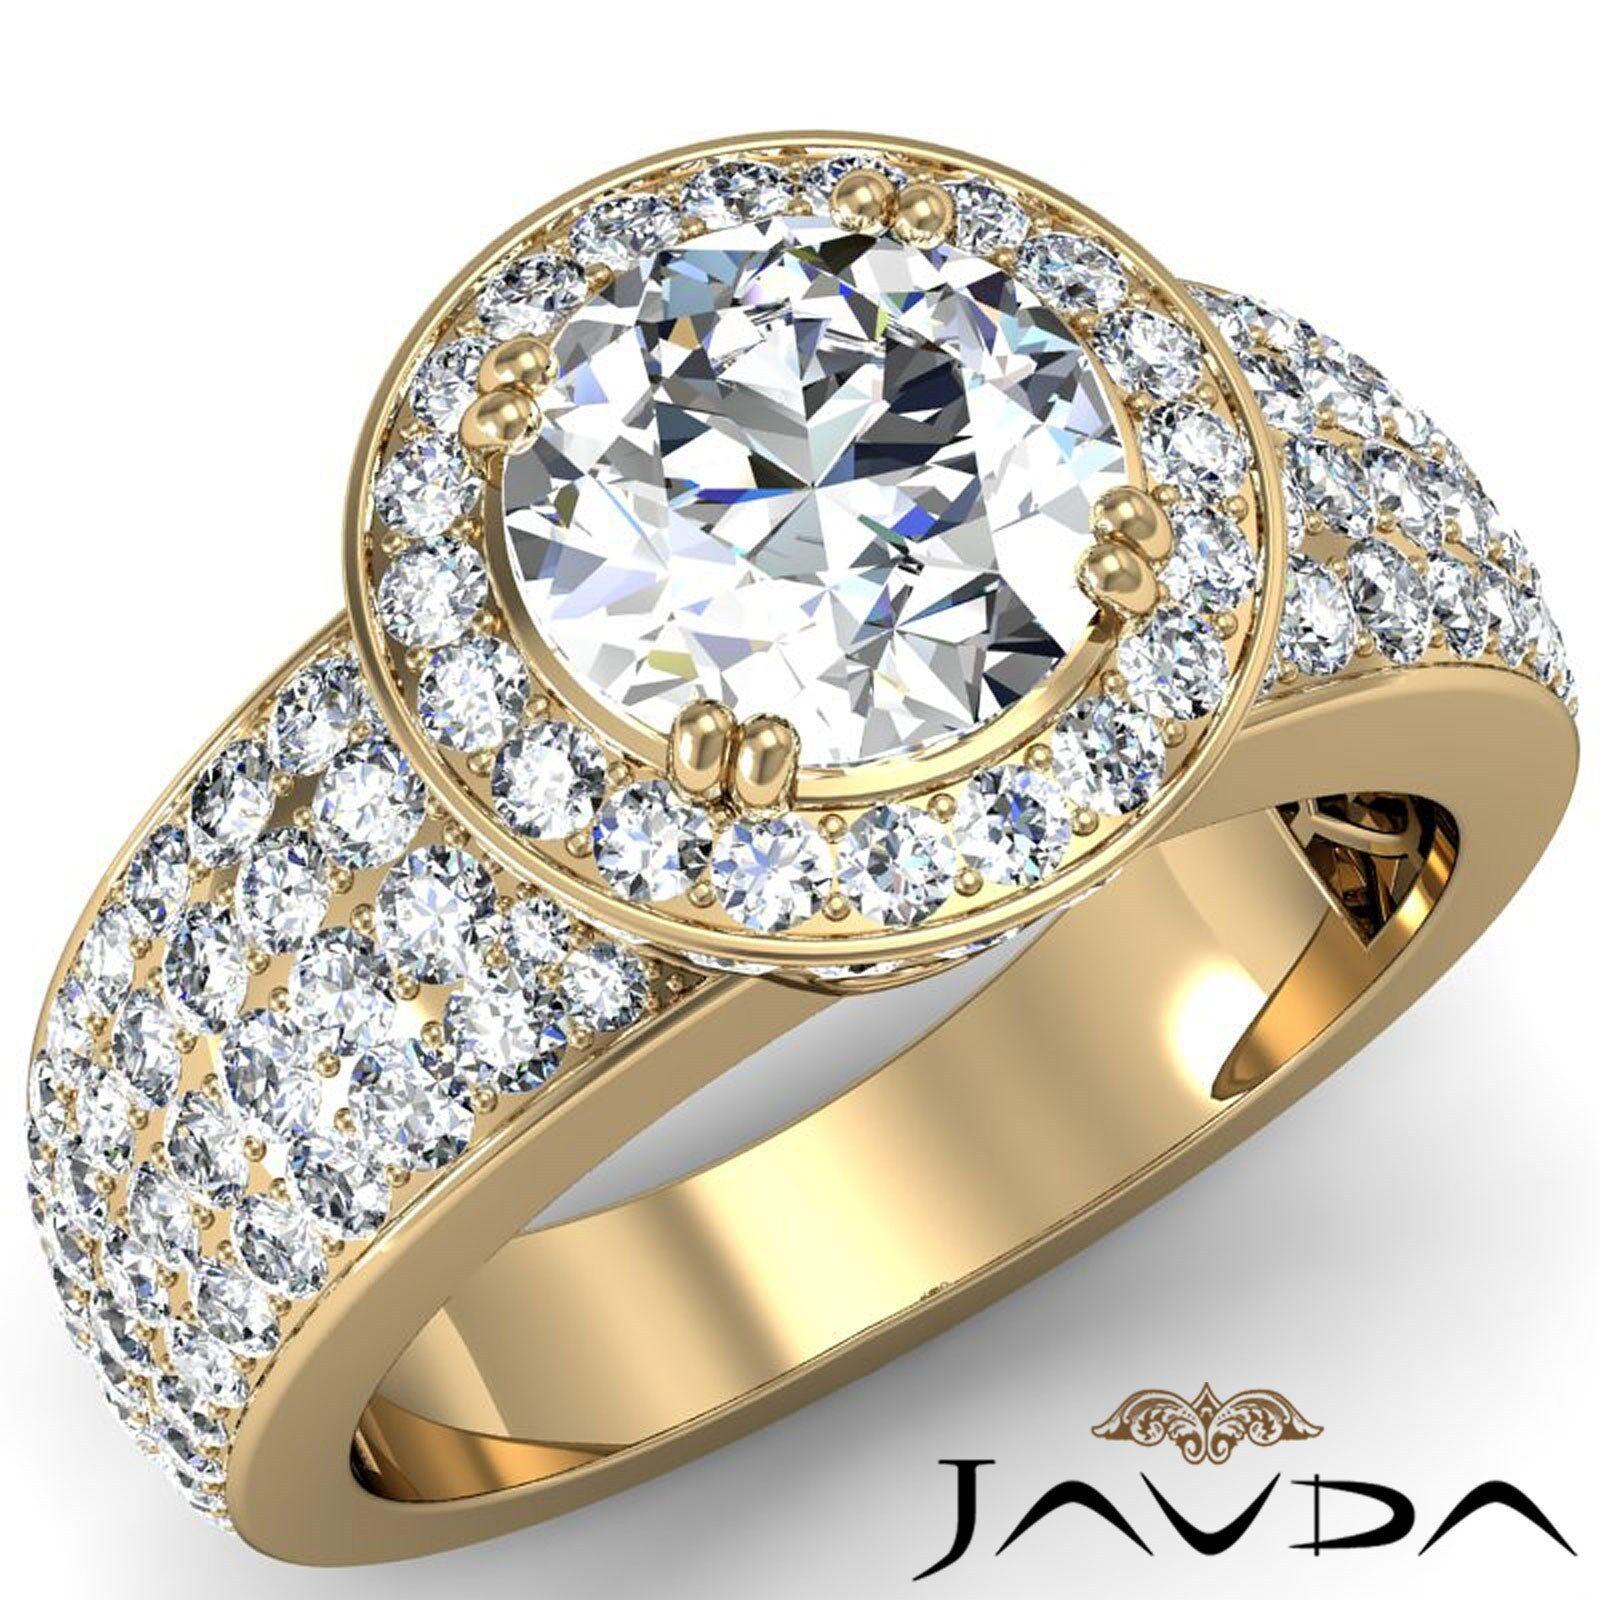 4 Row Halo Pave Round Diamond Engagement Ring GIA H VS1 18k Yellow Gold 3.03ct